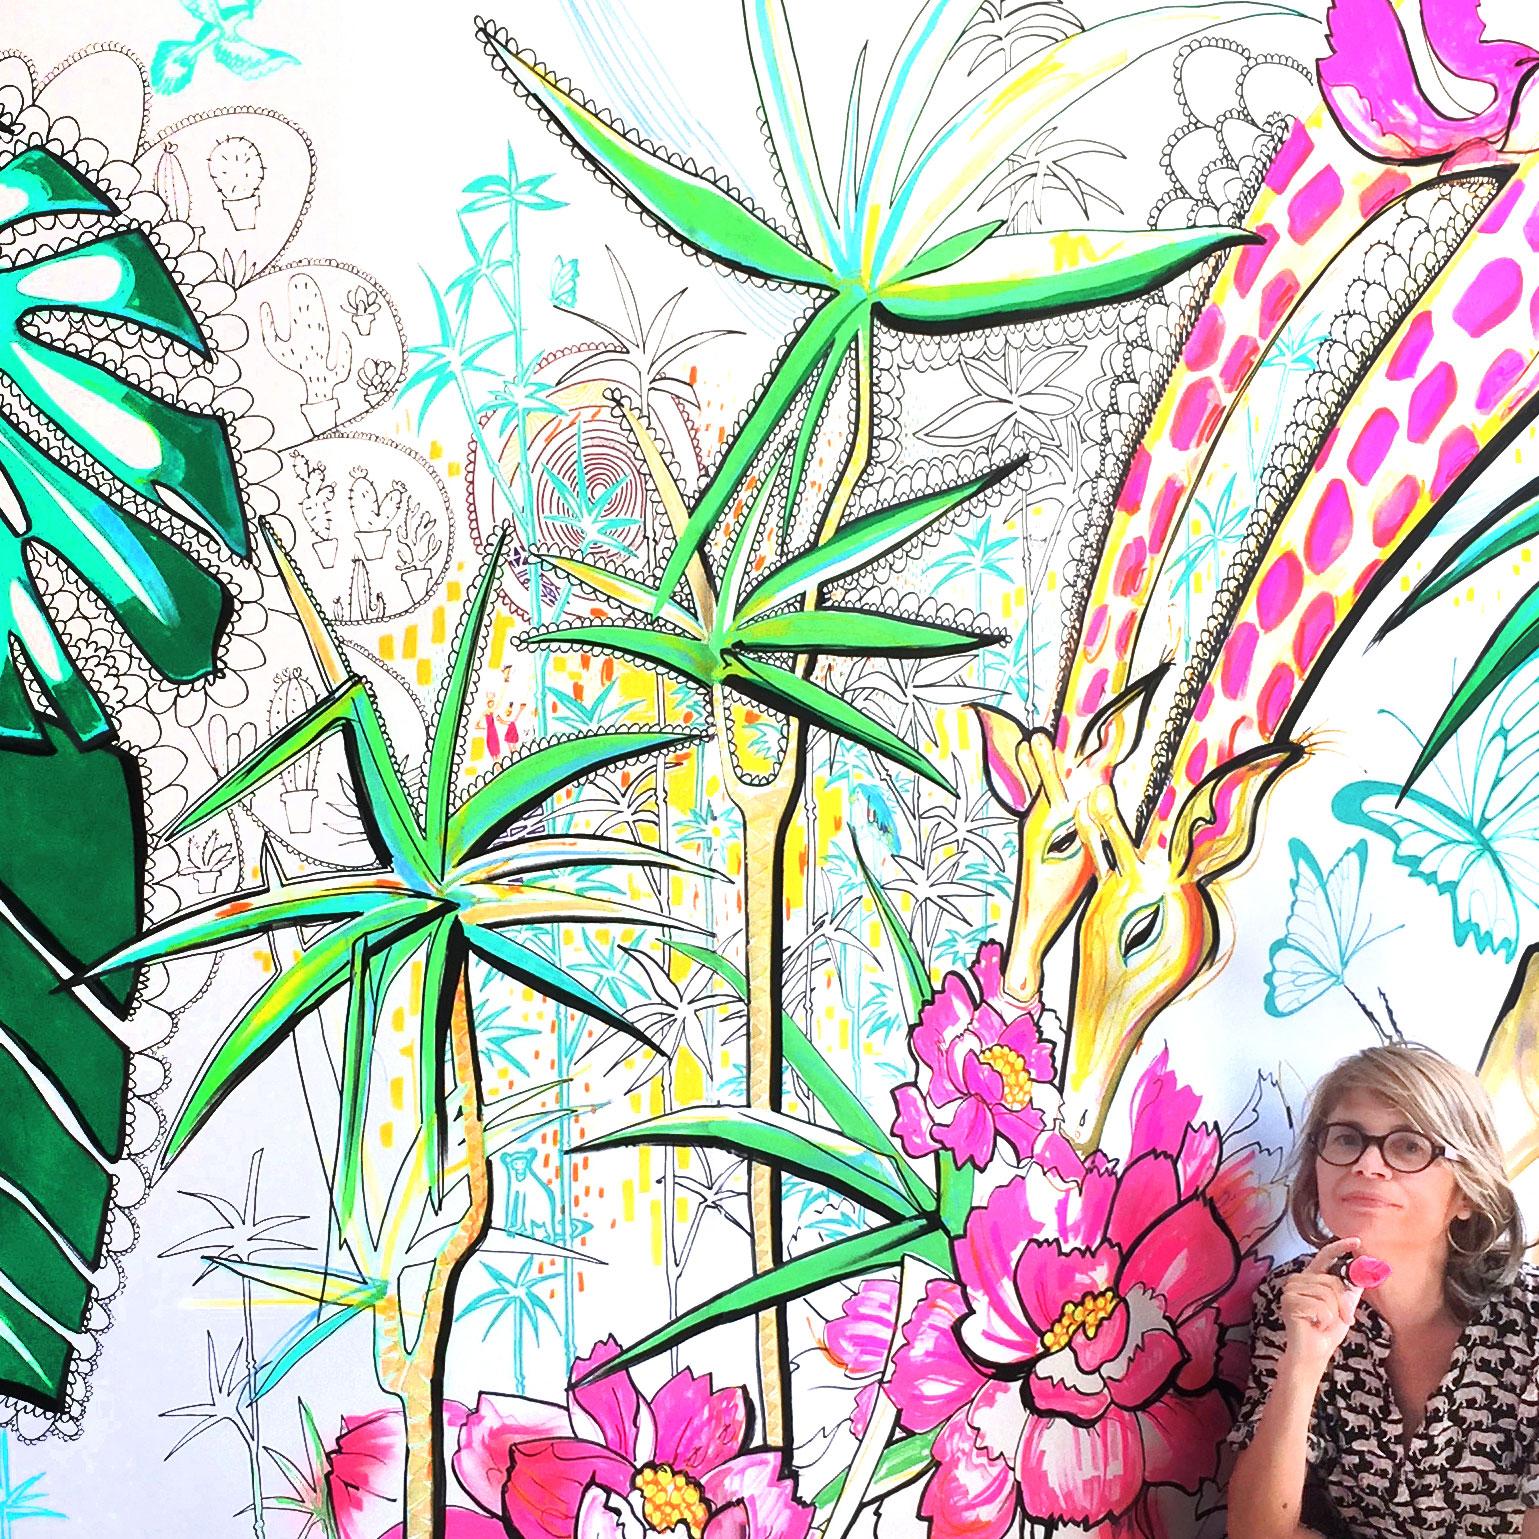 mural-AntoinetteFleur_deco-girafew